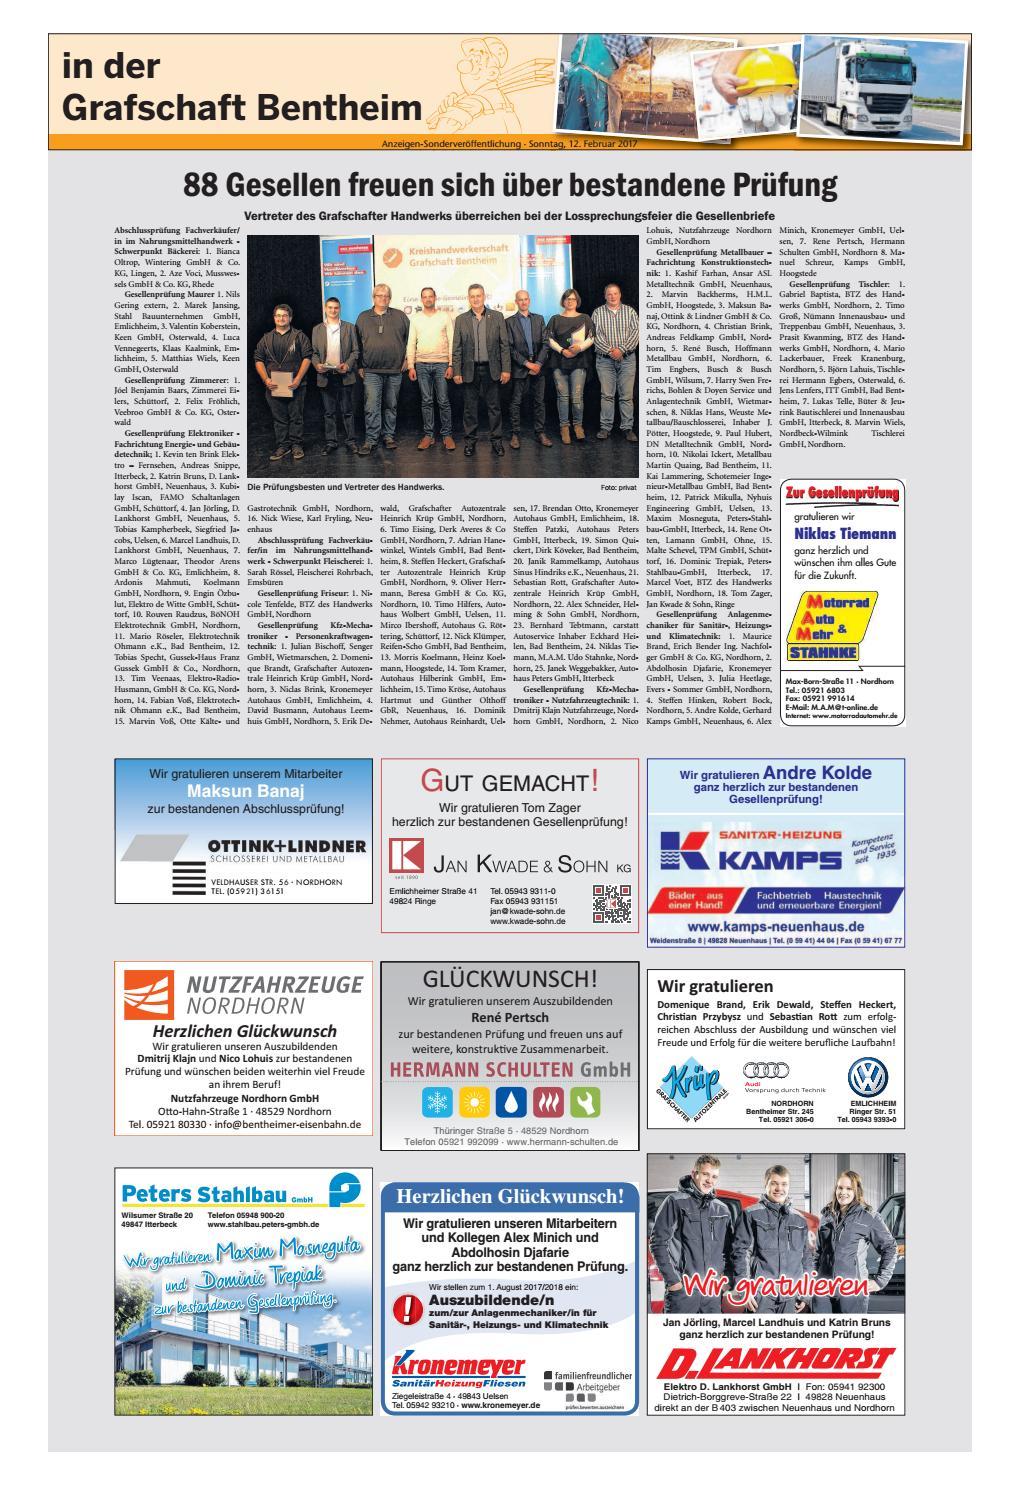 Len Nordhorn sonntagszeitung 12 02 2017 by sonntagszeitung issuu